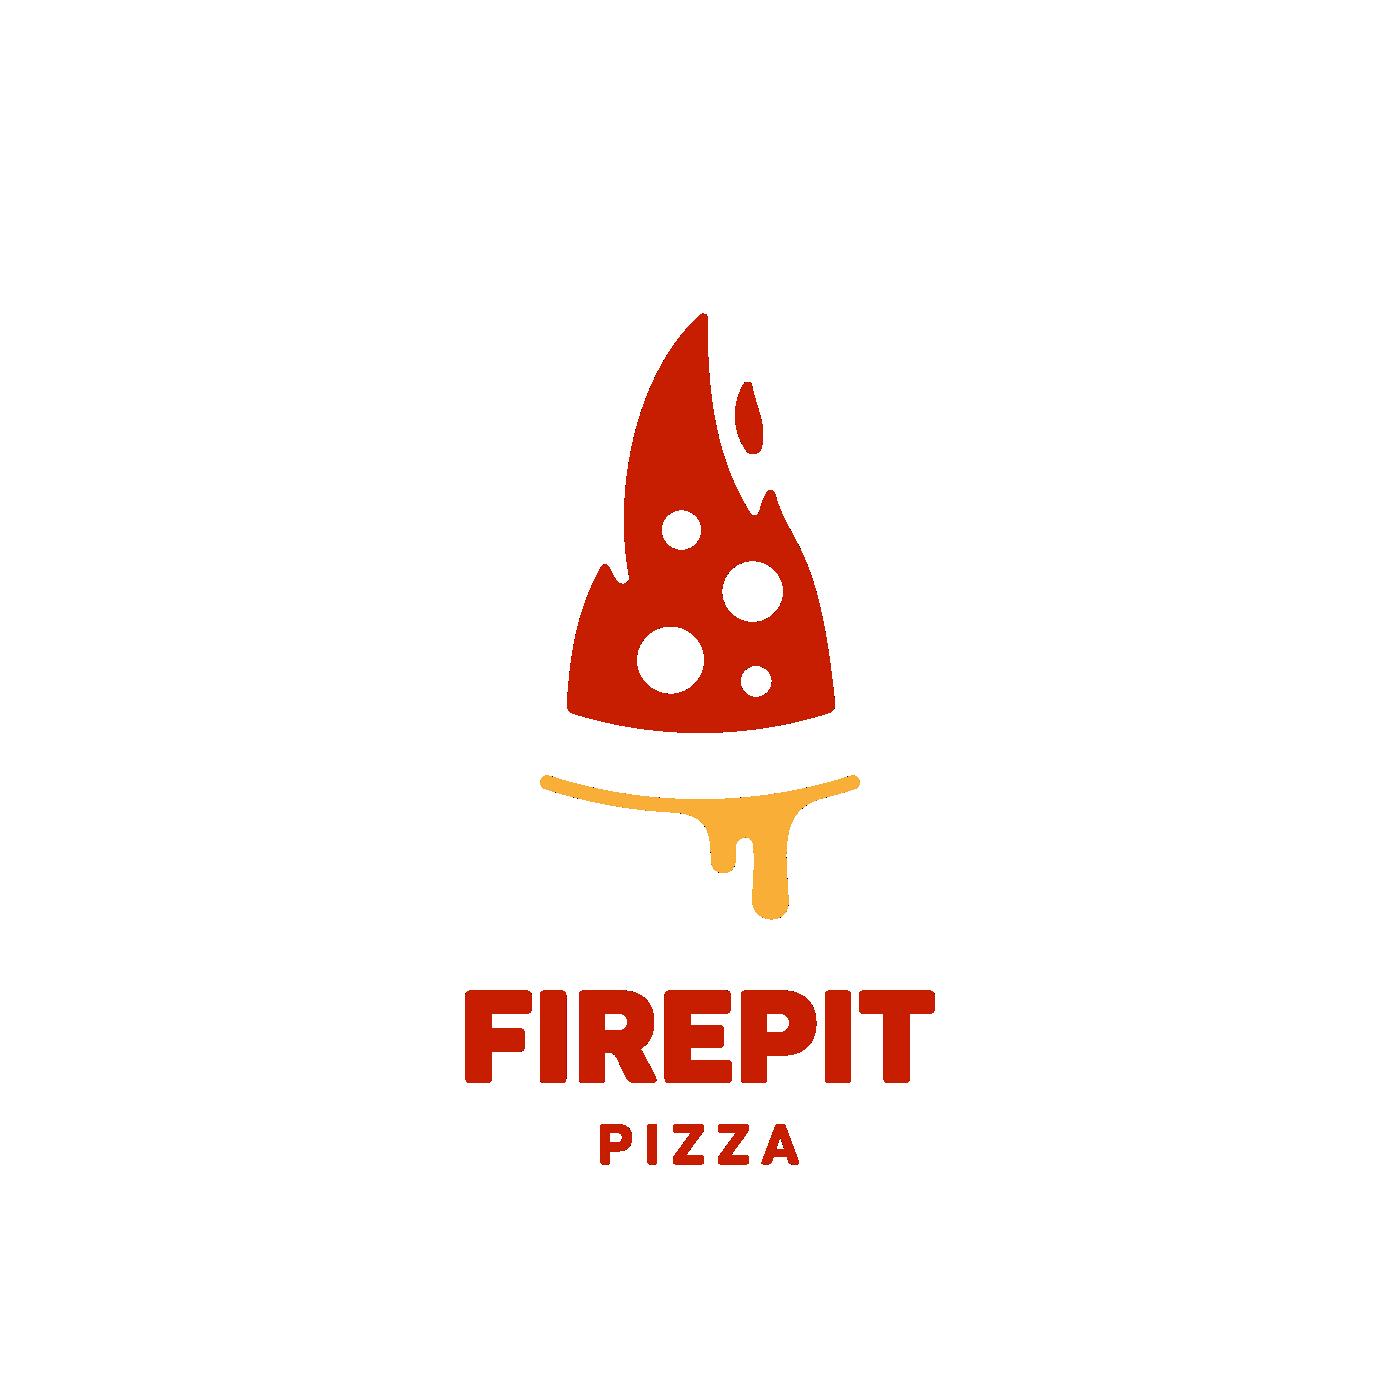 New Pizza Enterprise Logo